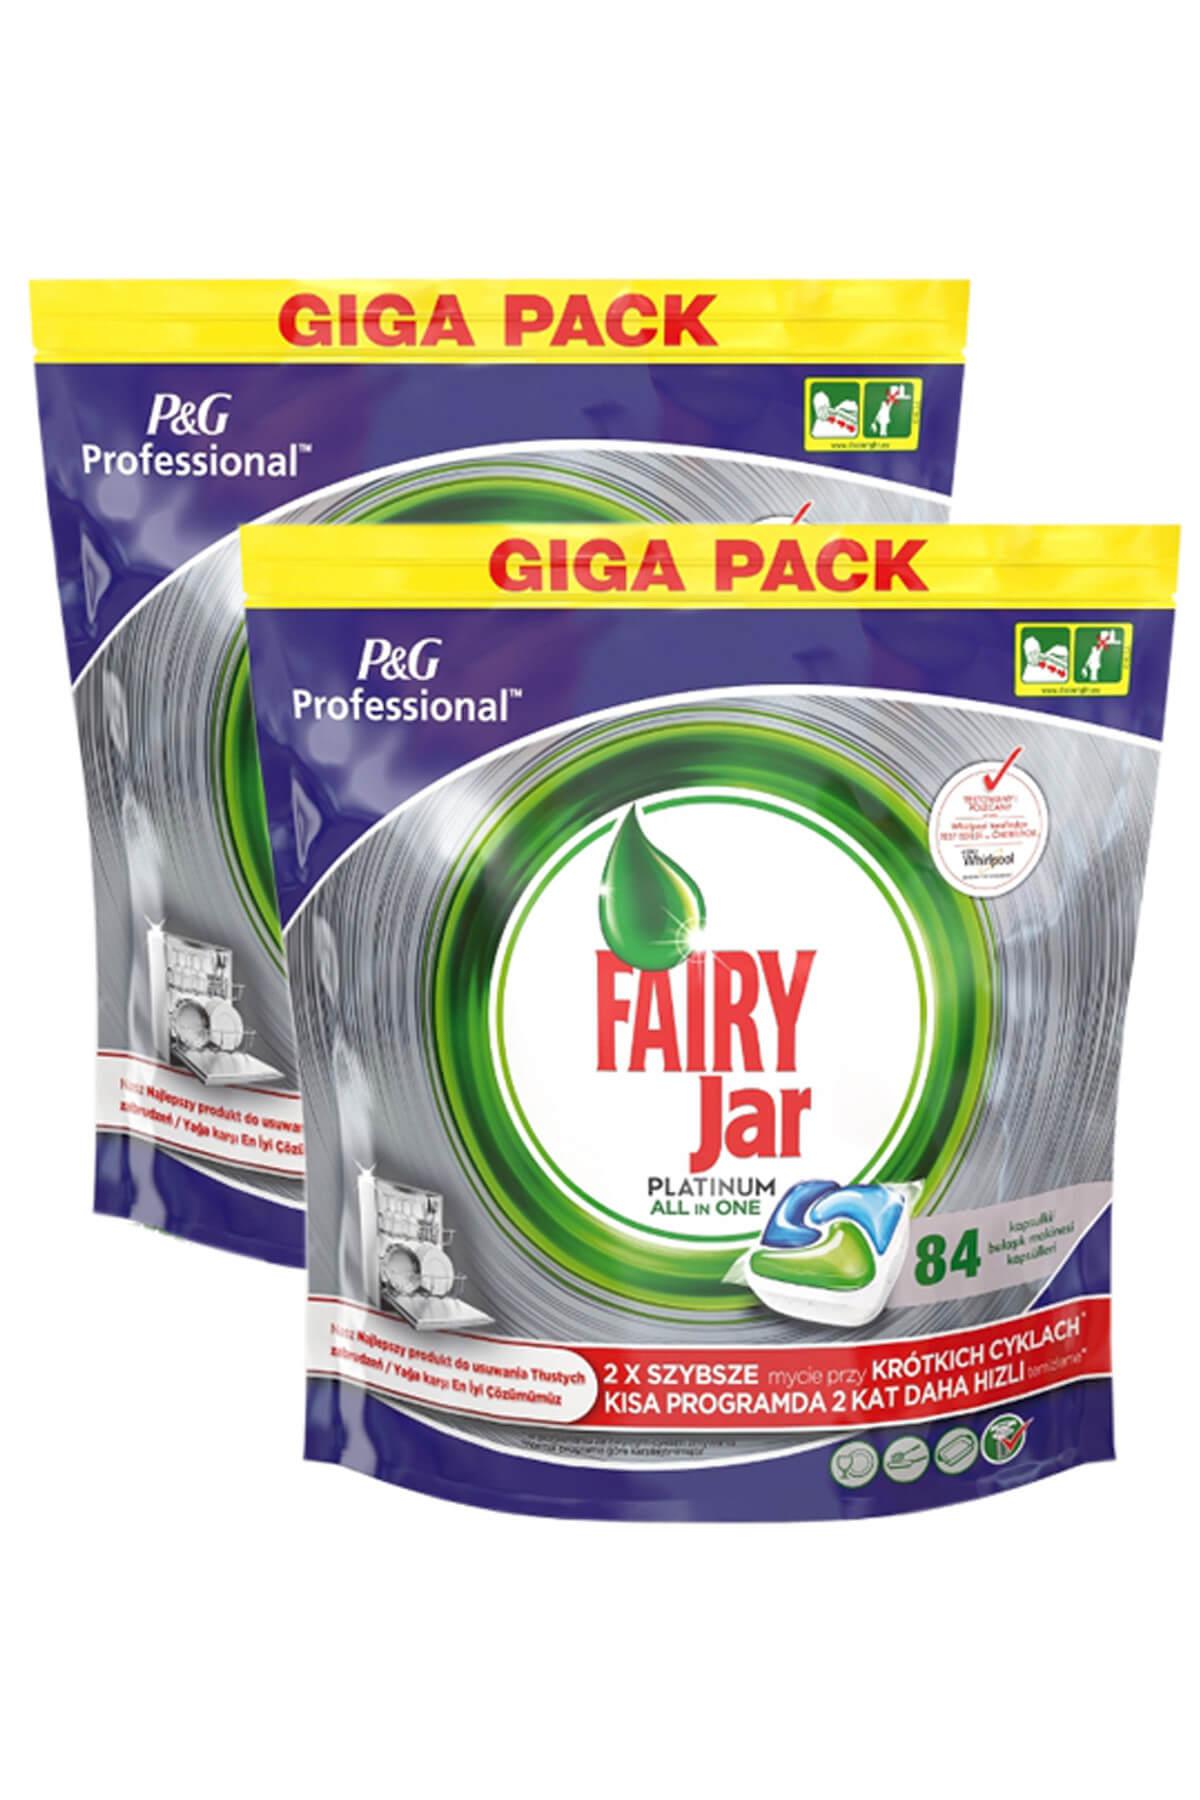 Fairy Jar Platinum Kapsül 84'lü  x 2 Adet 7777777174328 1